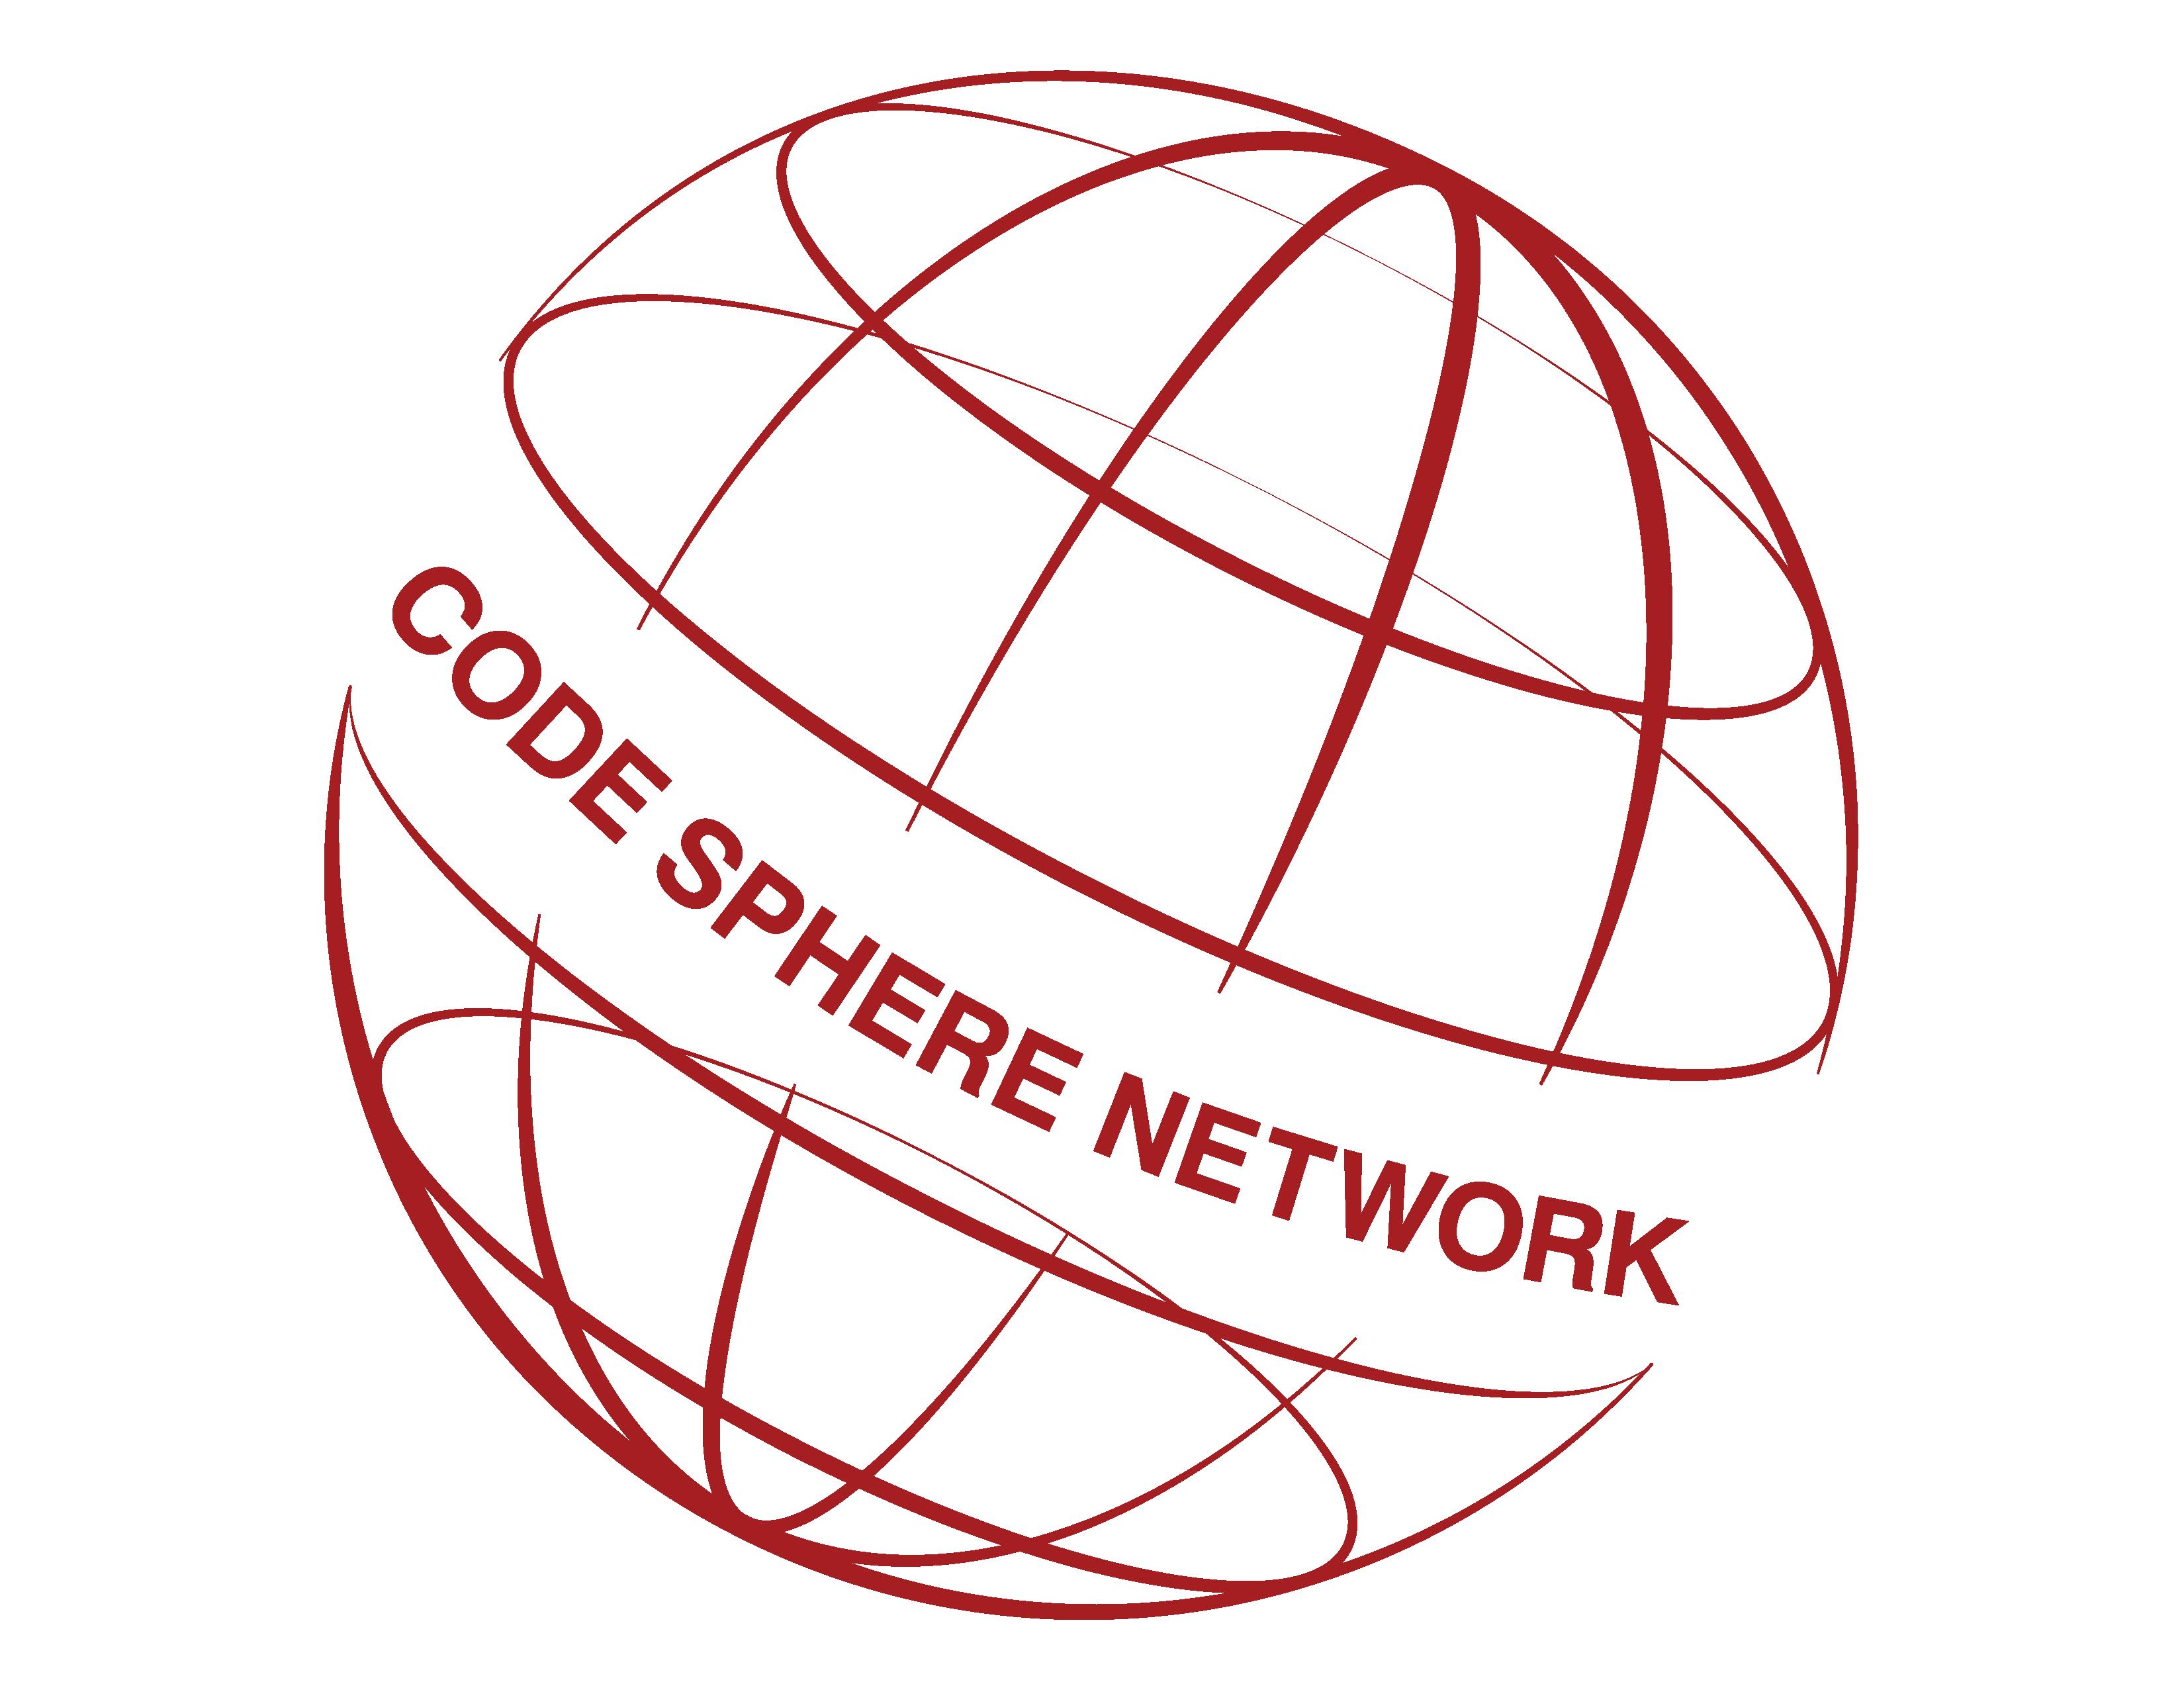 Code Sphere Network Inc.